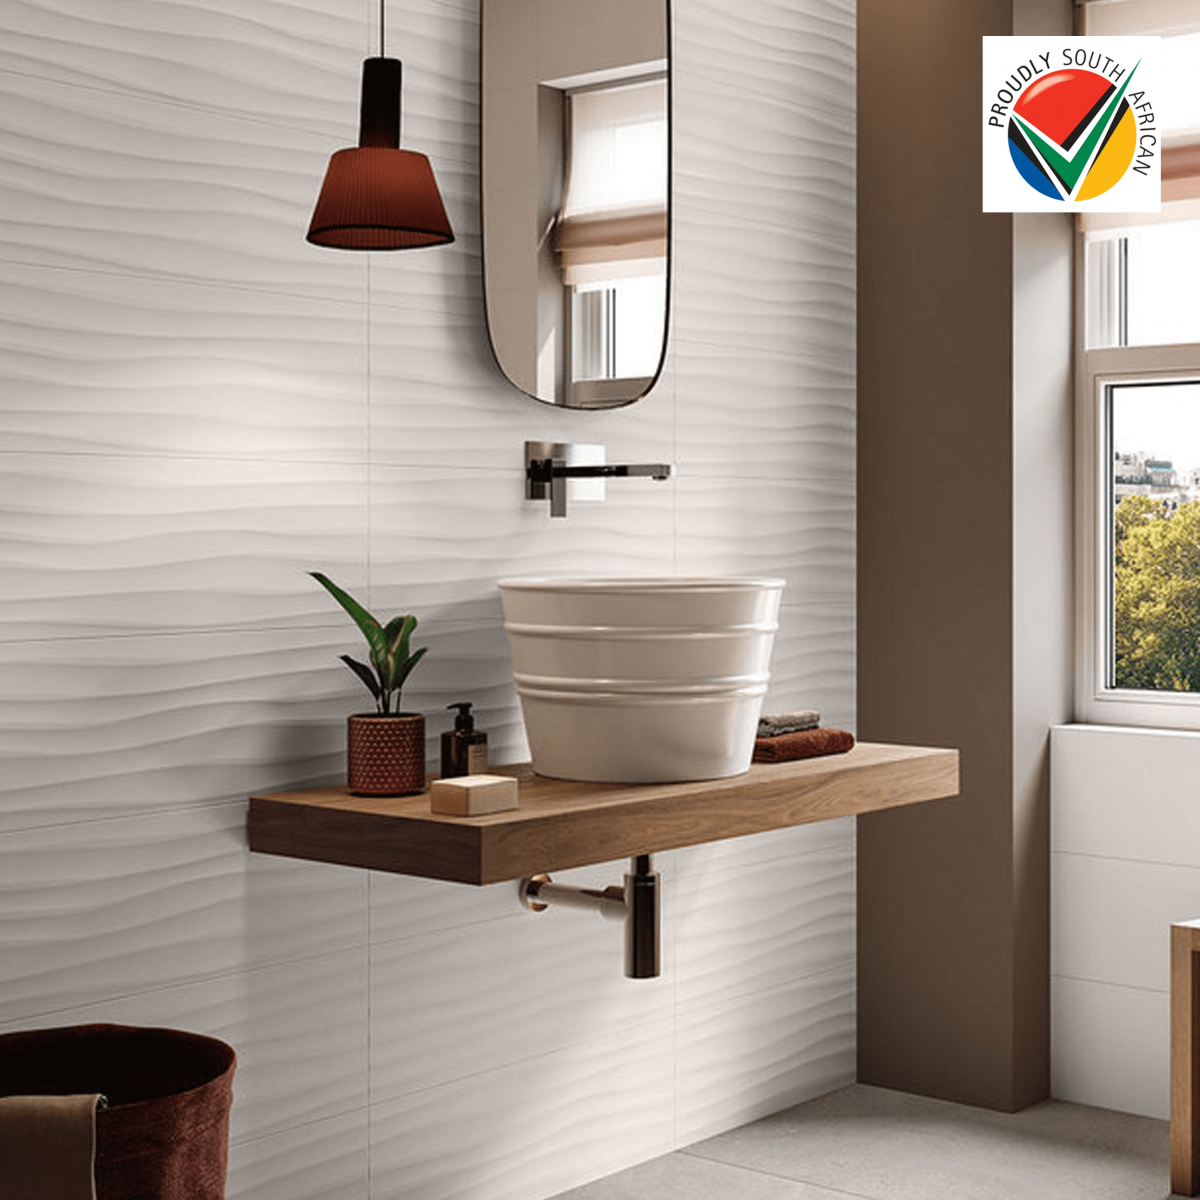 Ceramic Industries Onda Bianco 300x600mm_lifestyle